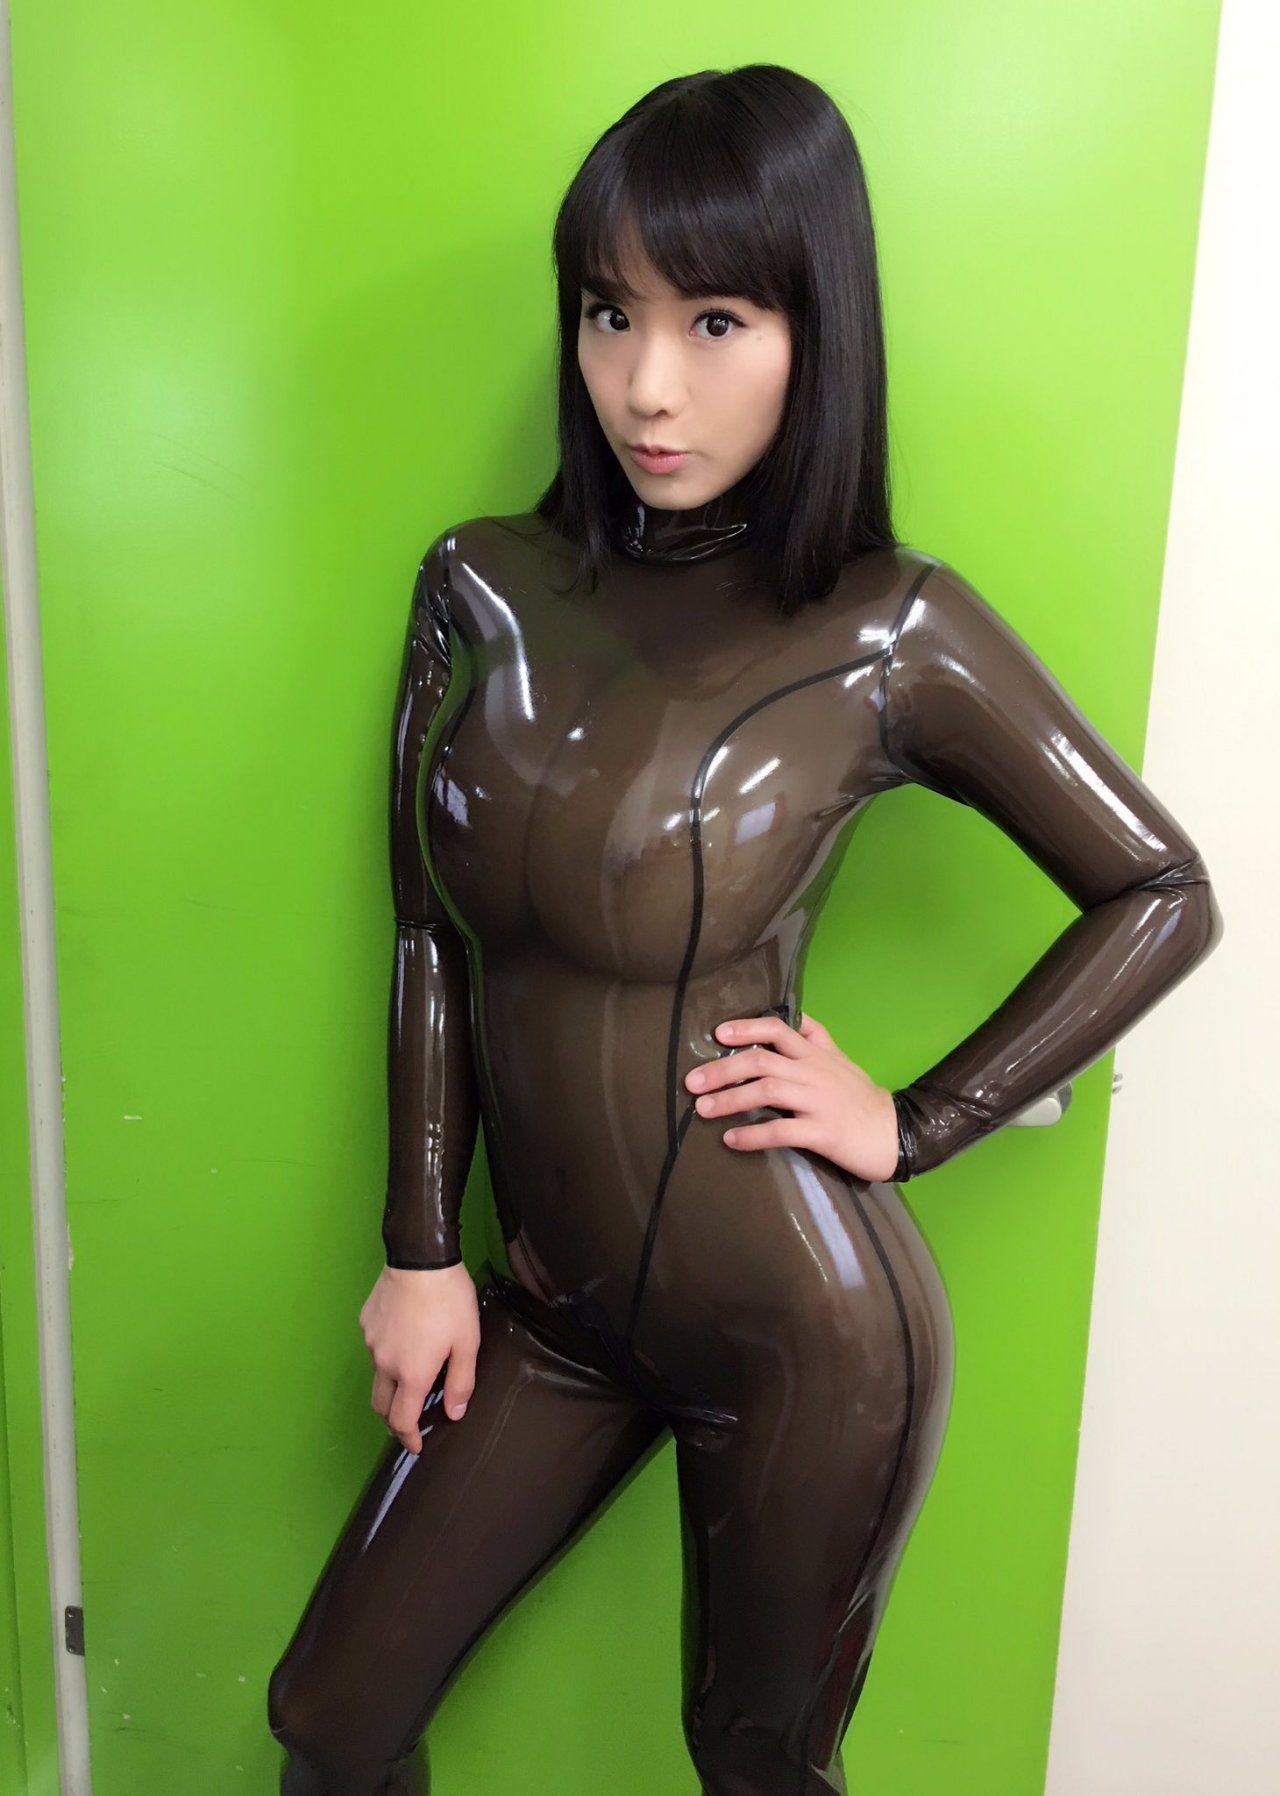 Japanese download scat porn clips